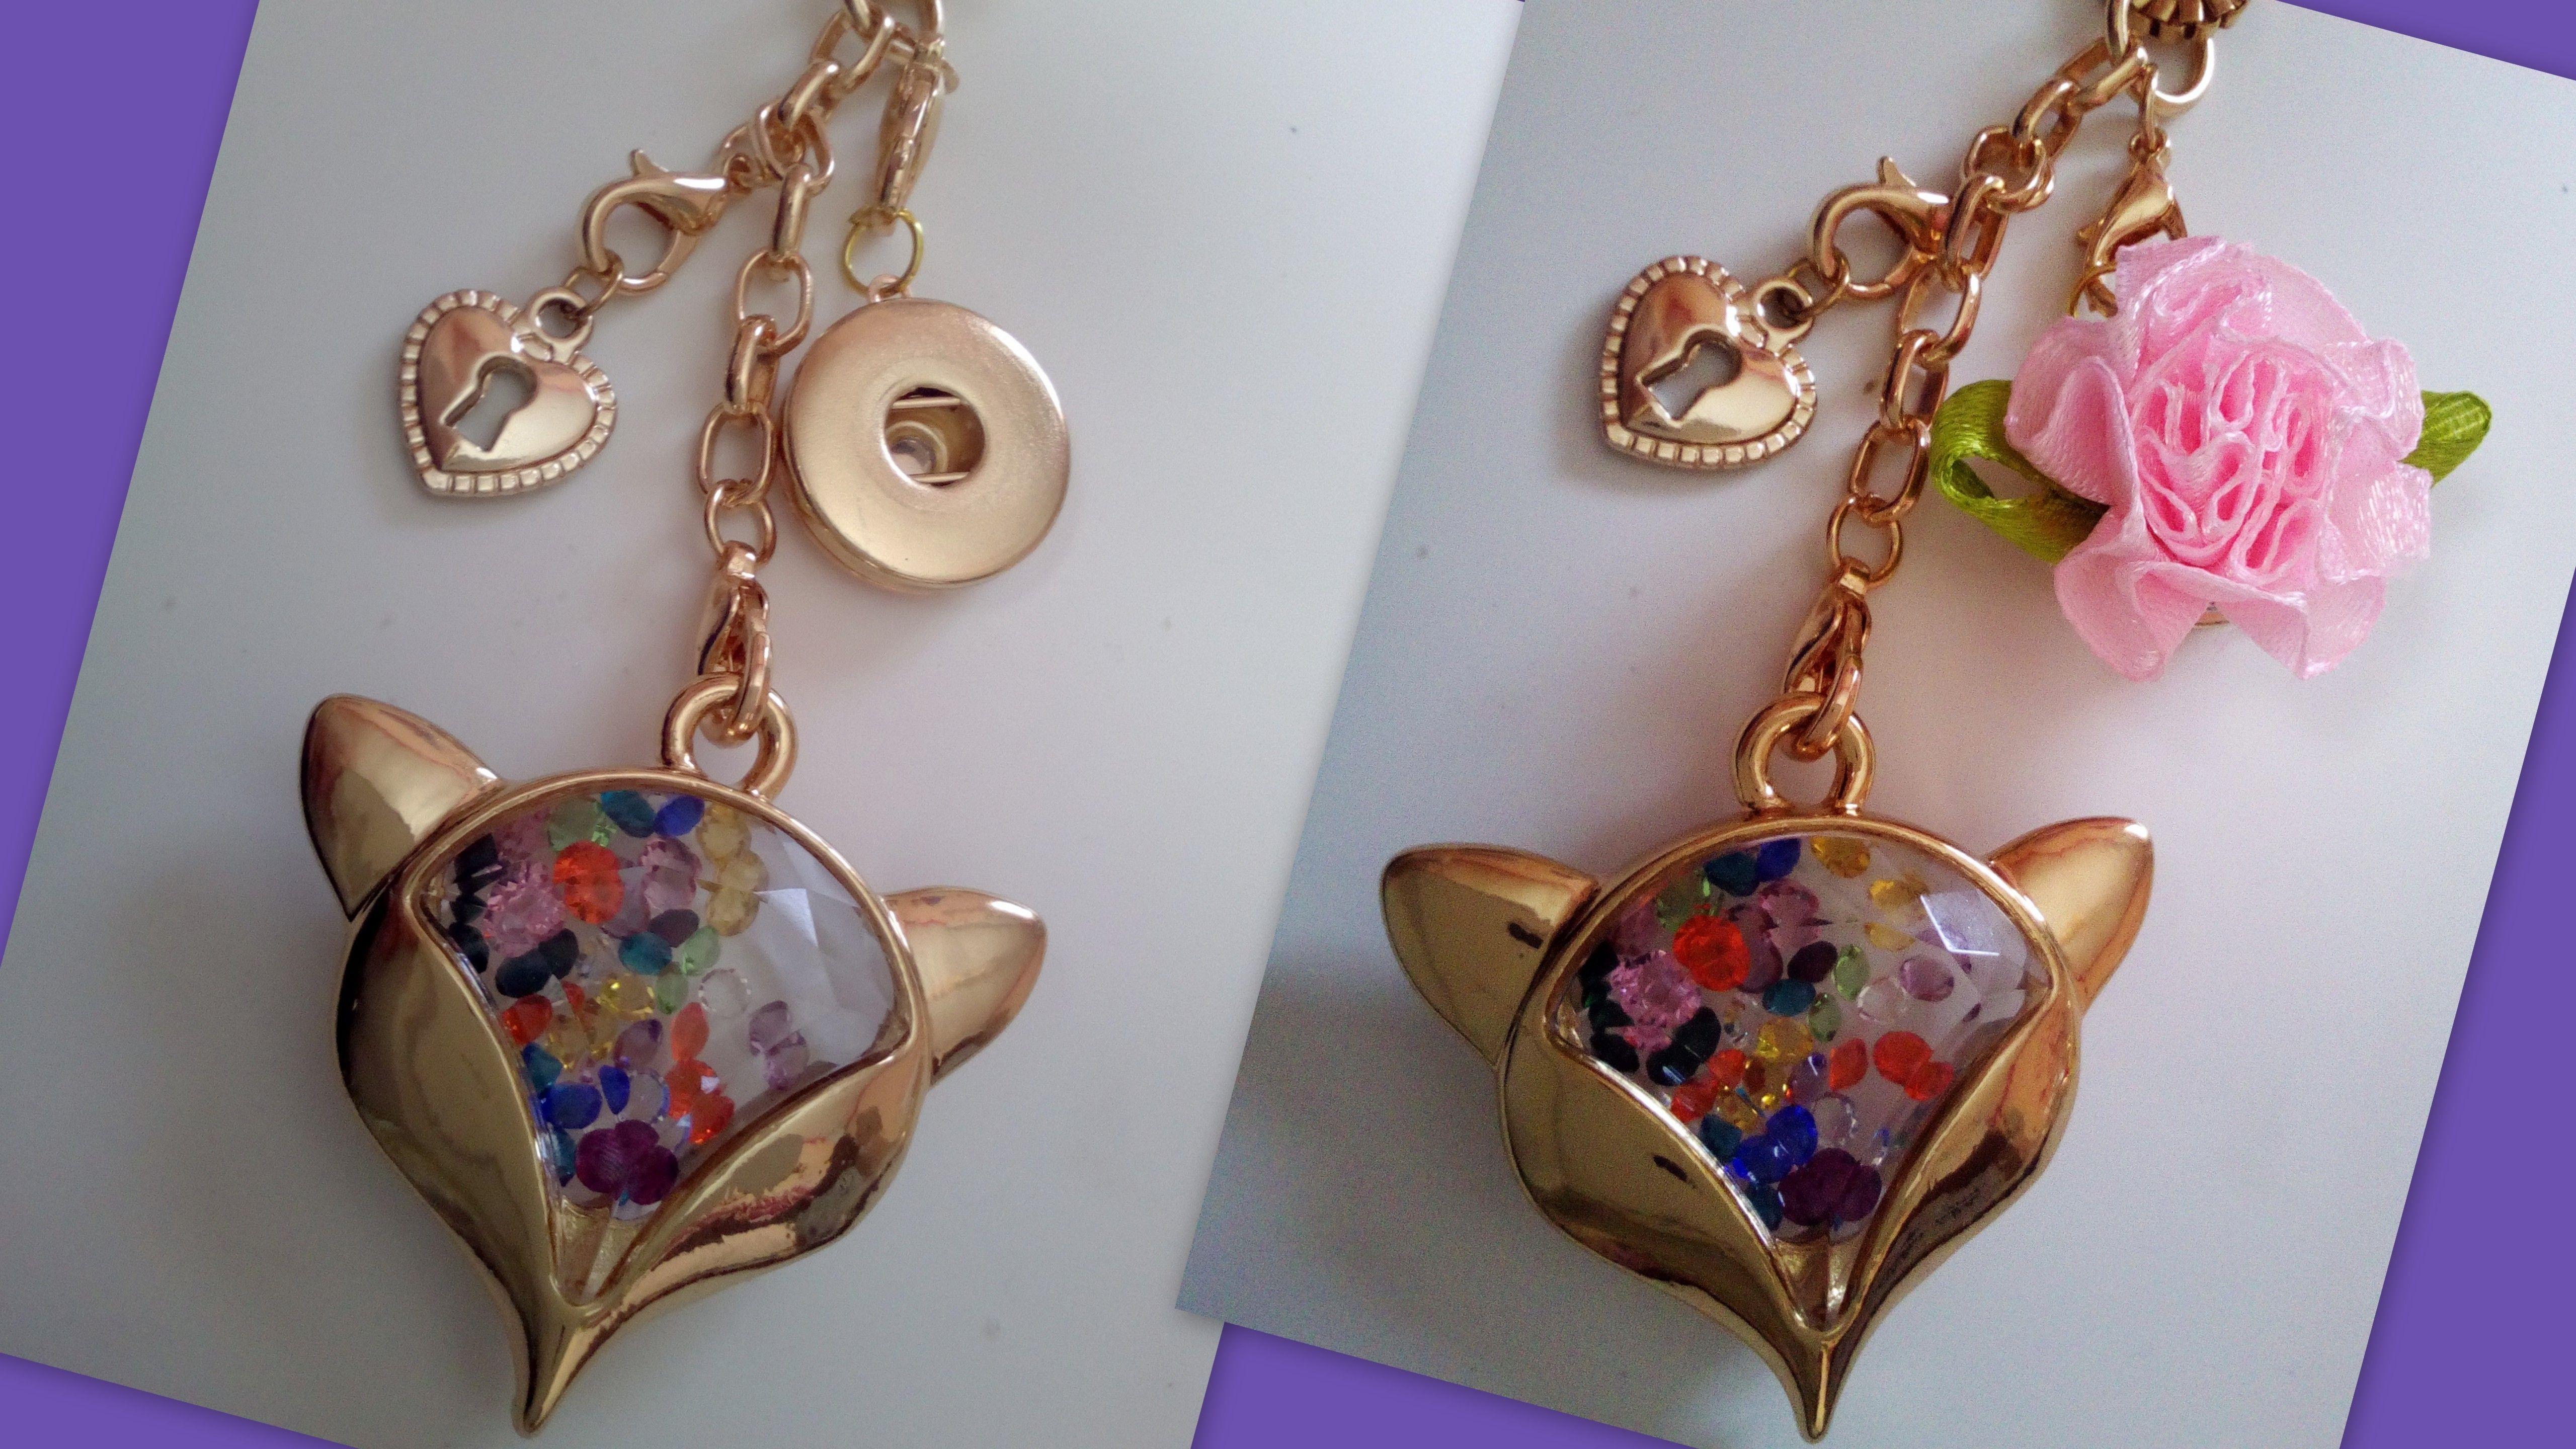 Mom 18-25 mm Snap Ginger Popper Noosa Socket Pendant Fish Glass Locket Rhinestone Crystals Woman Necklace Mother Birthday Gift